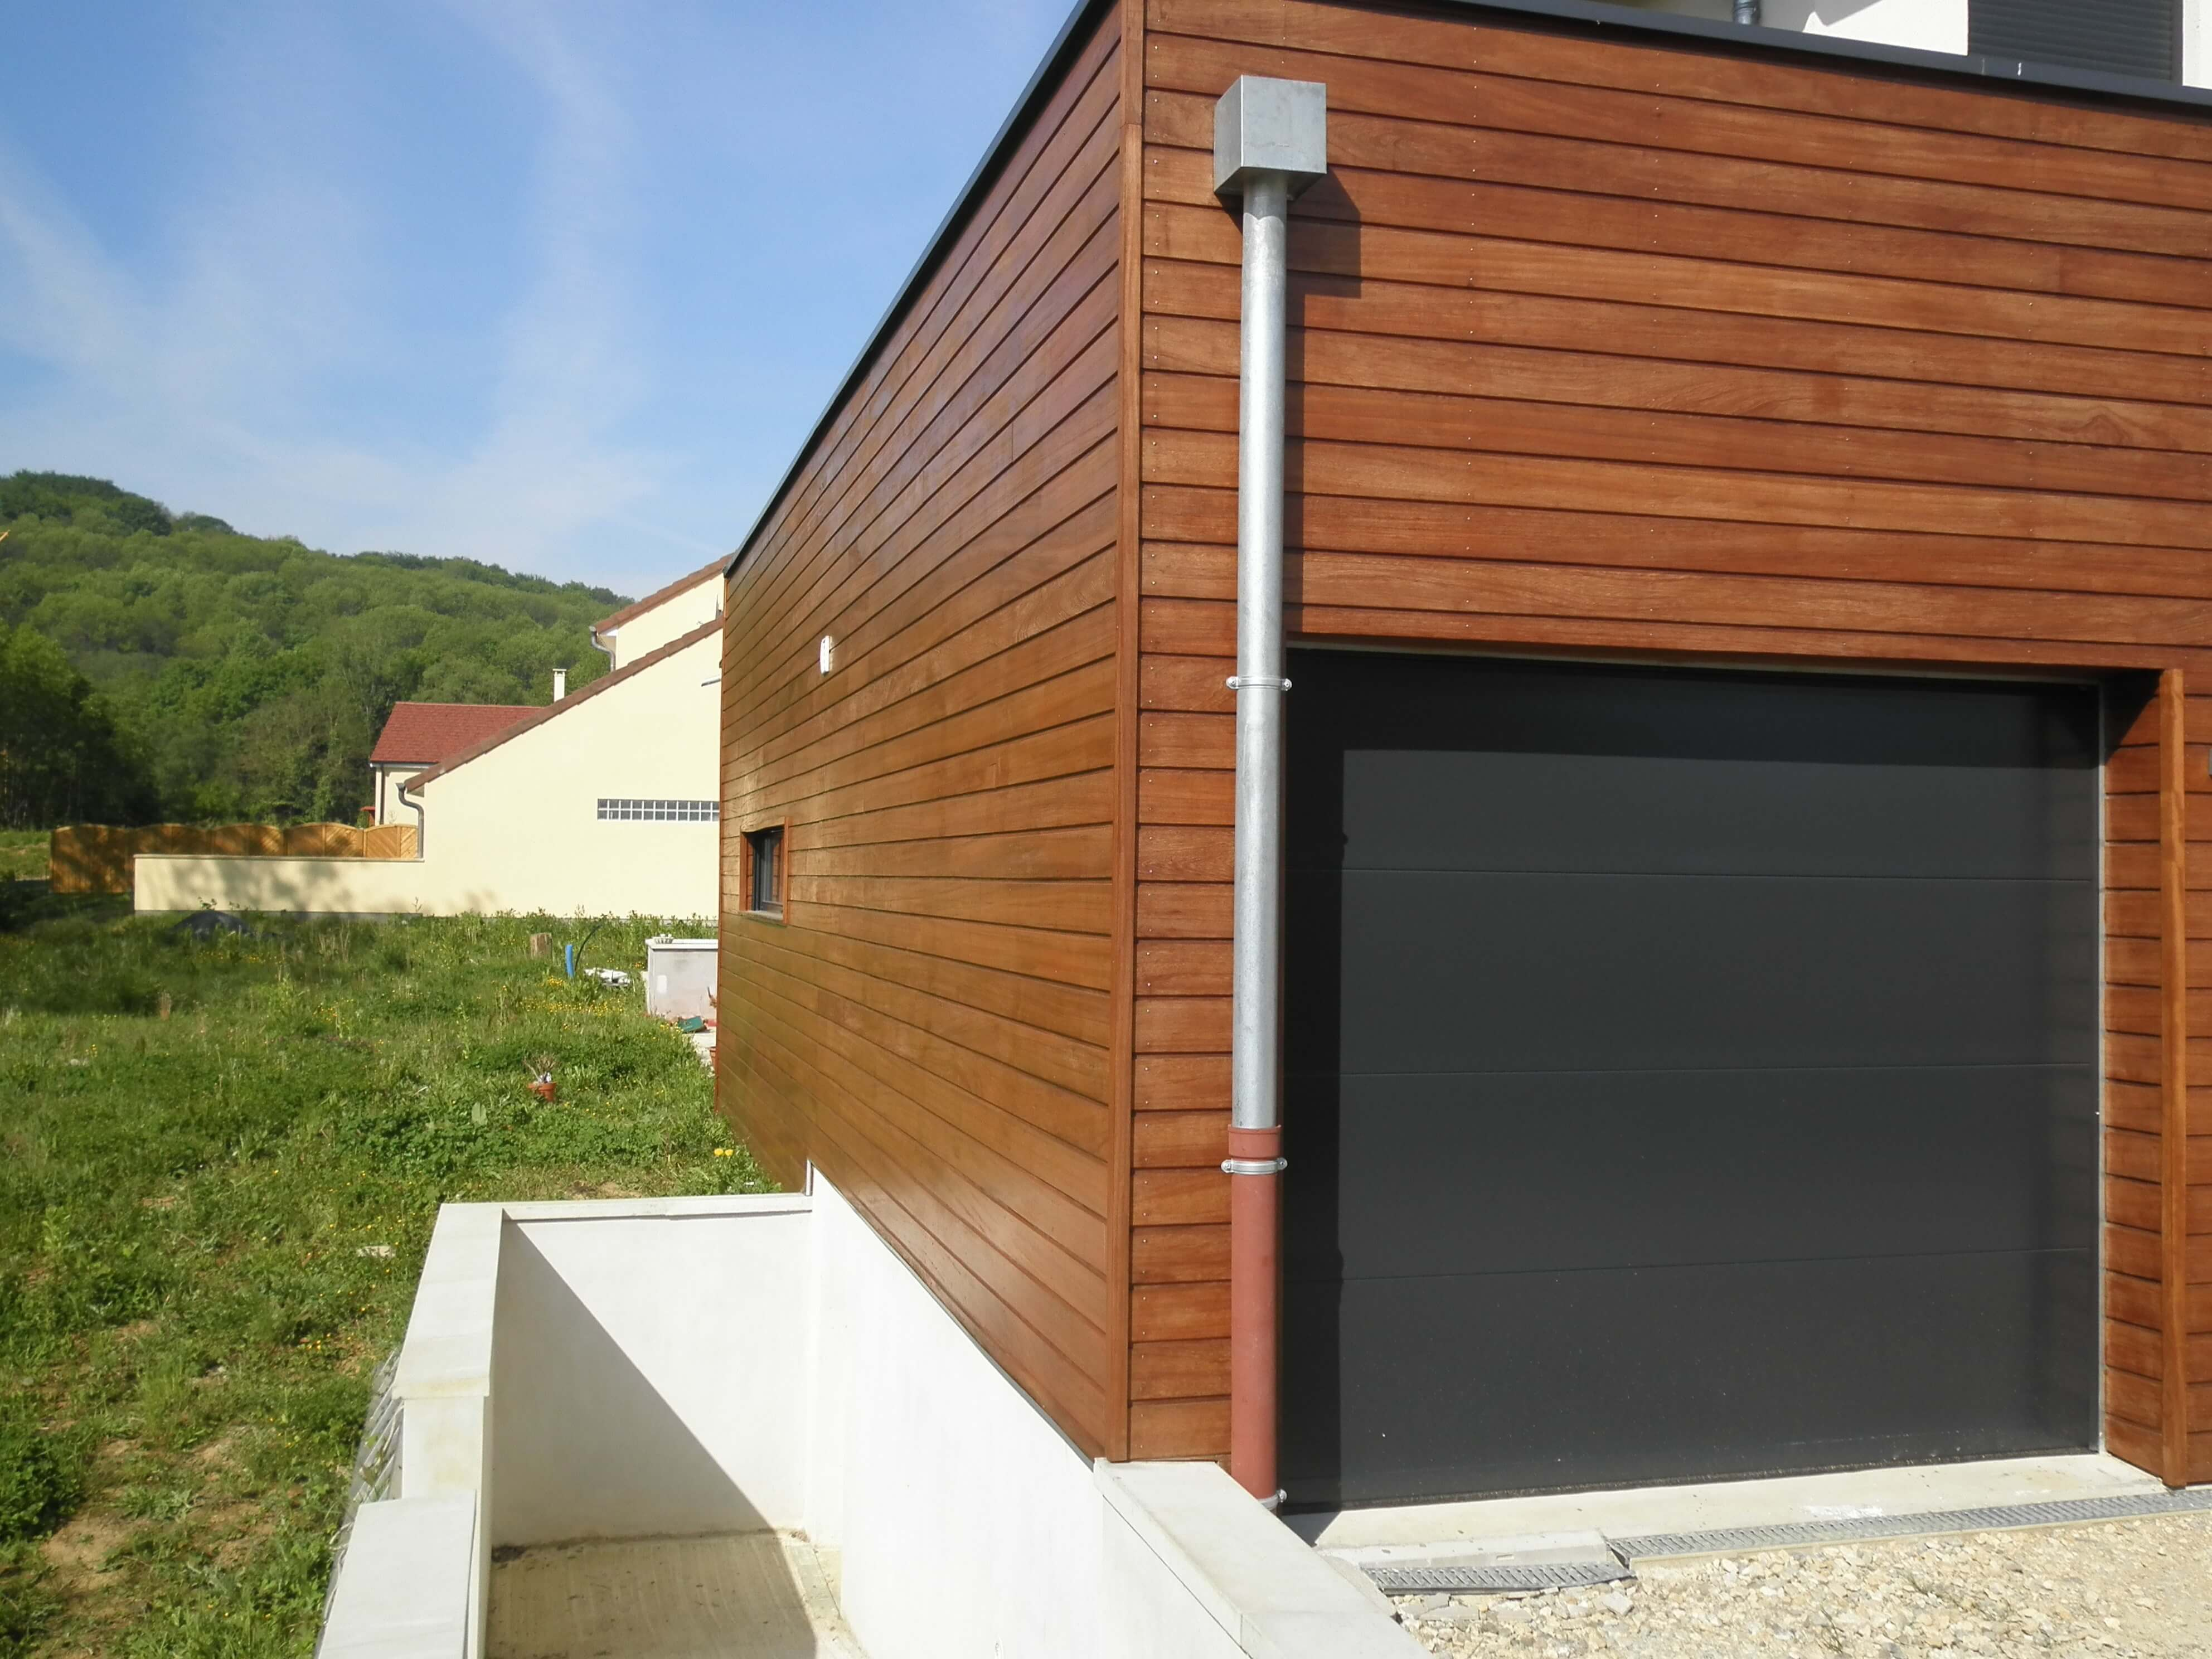 Pierre Naturelle Pour Facade bardage façade avec aspect naturel